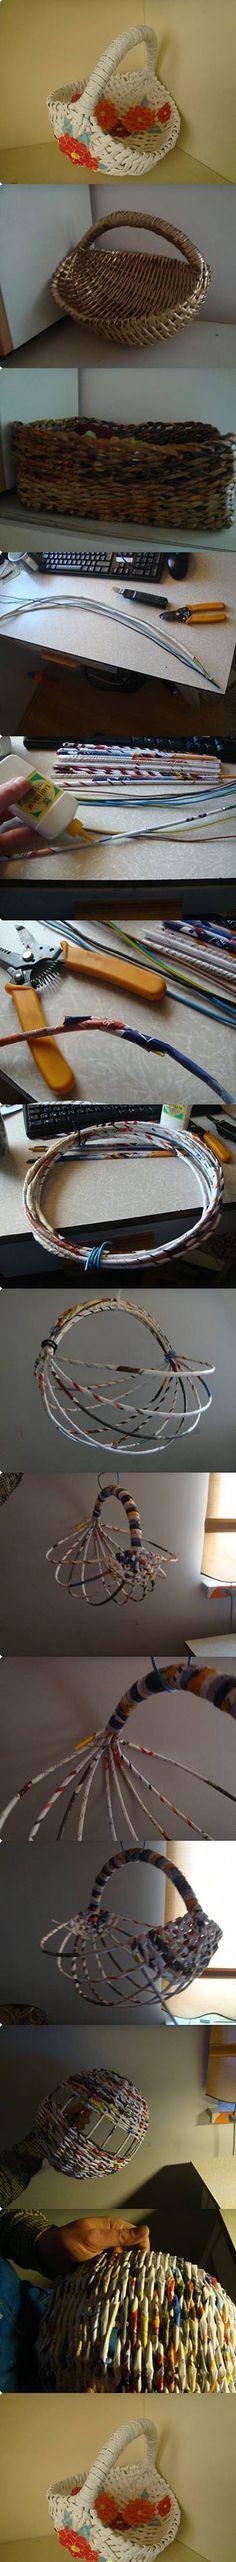 Diy Beautiful Basket | DIY & Crafts Tutorials